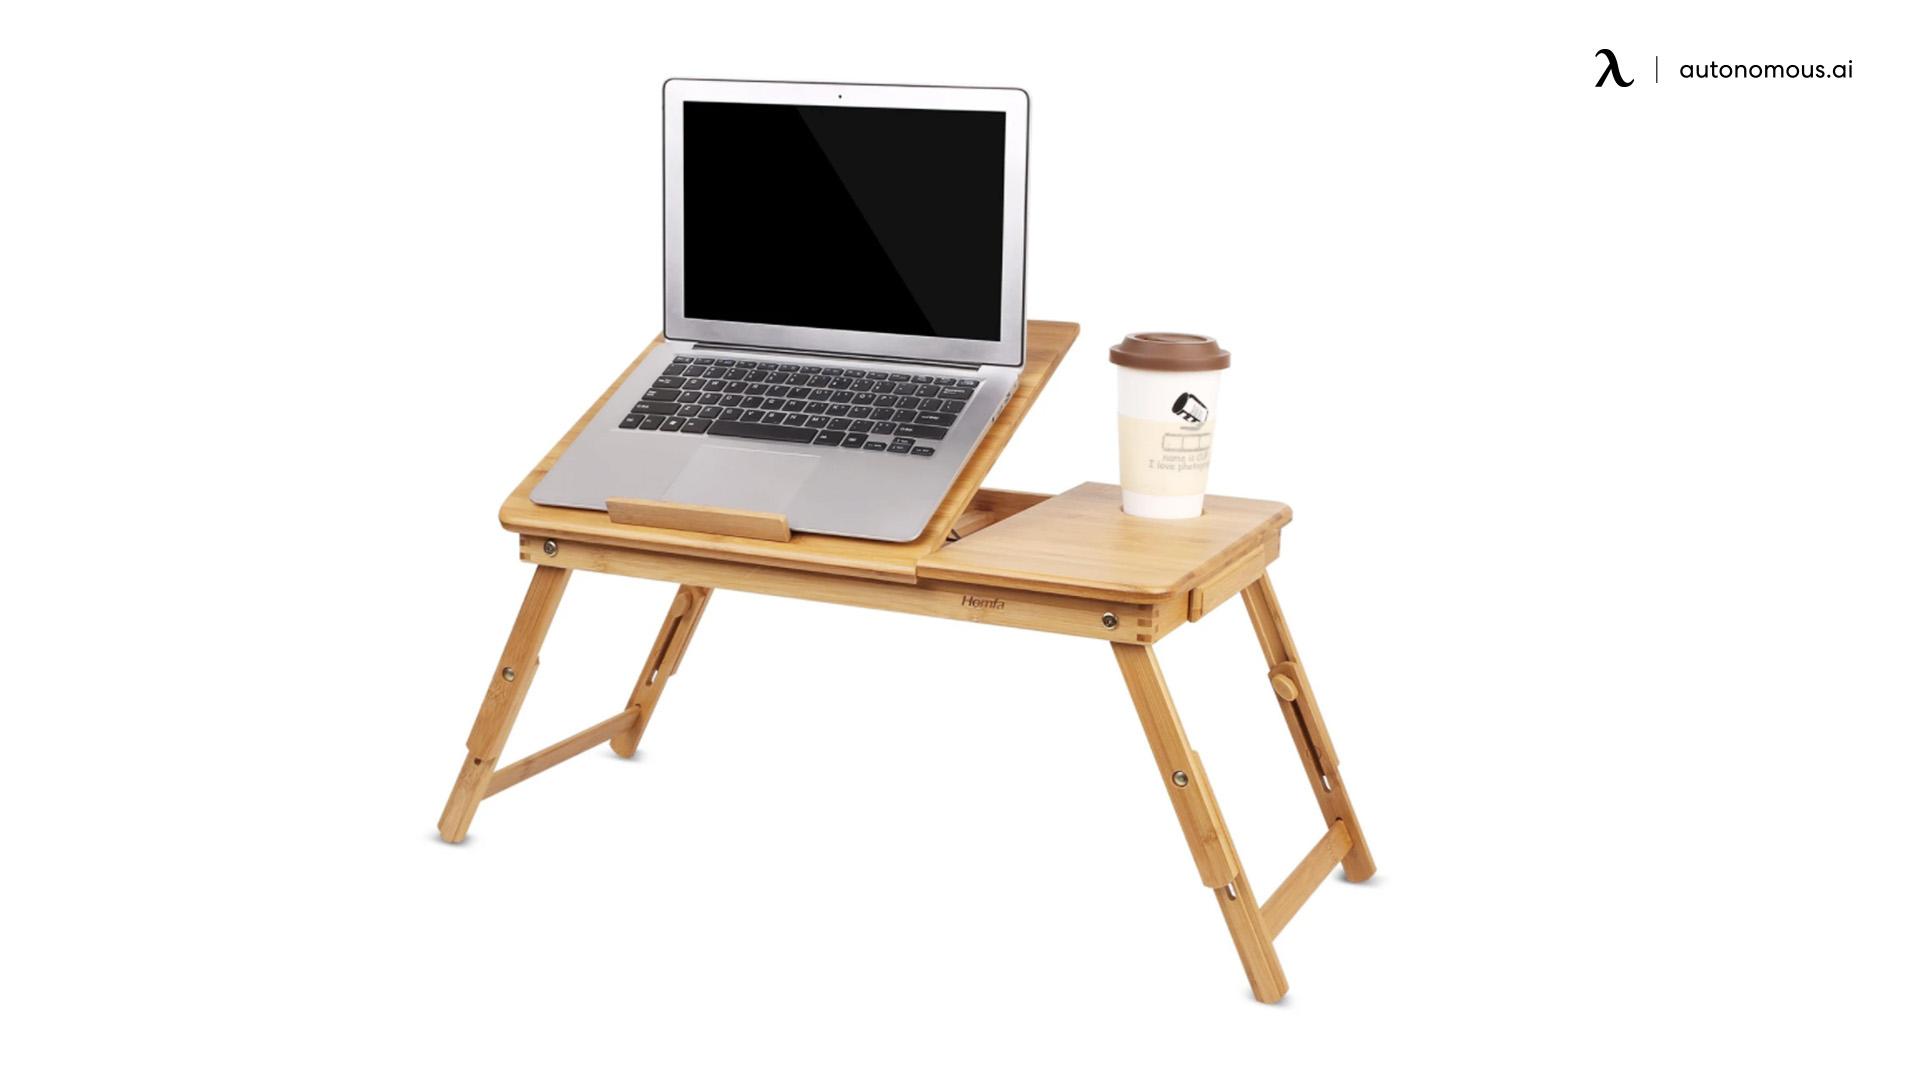 The HOMFA bamboo laptop desk